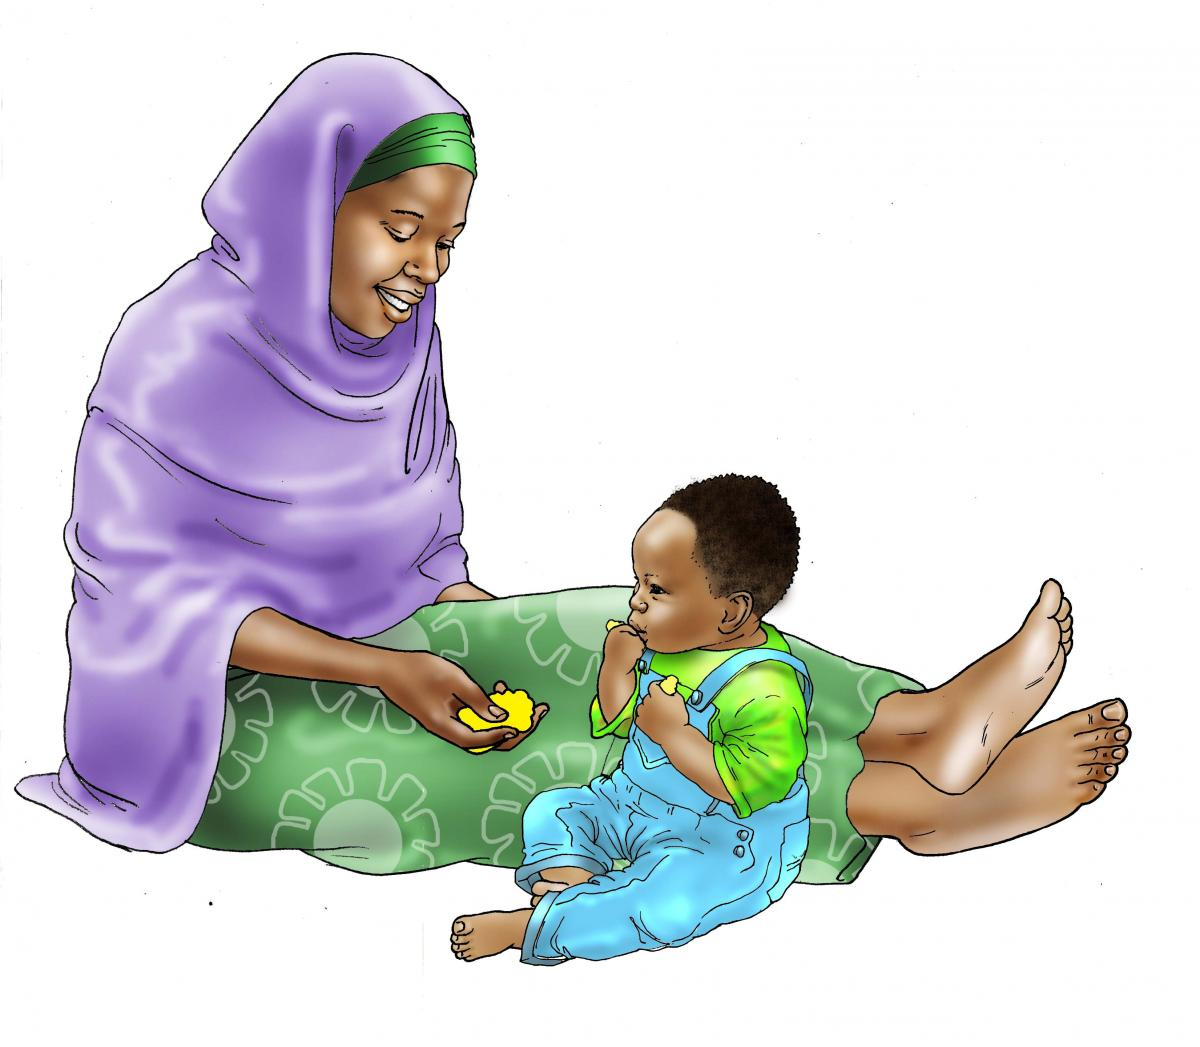 Complementary Feeding - Complementary Feeding 9-12 mo 9-12 mo - 06A - Niger